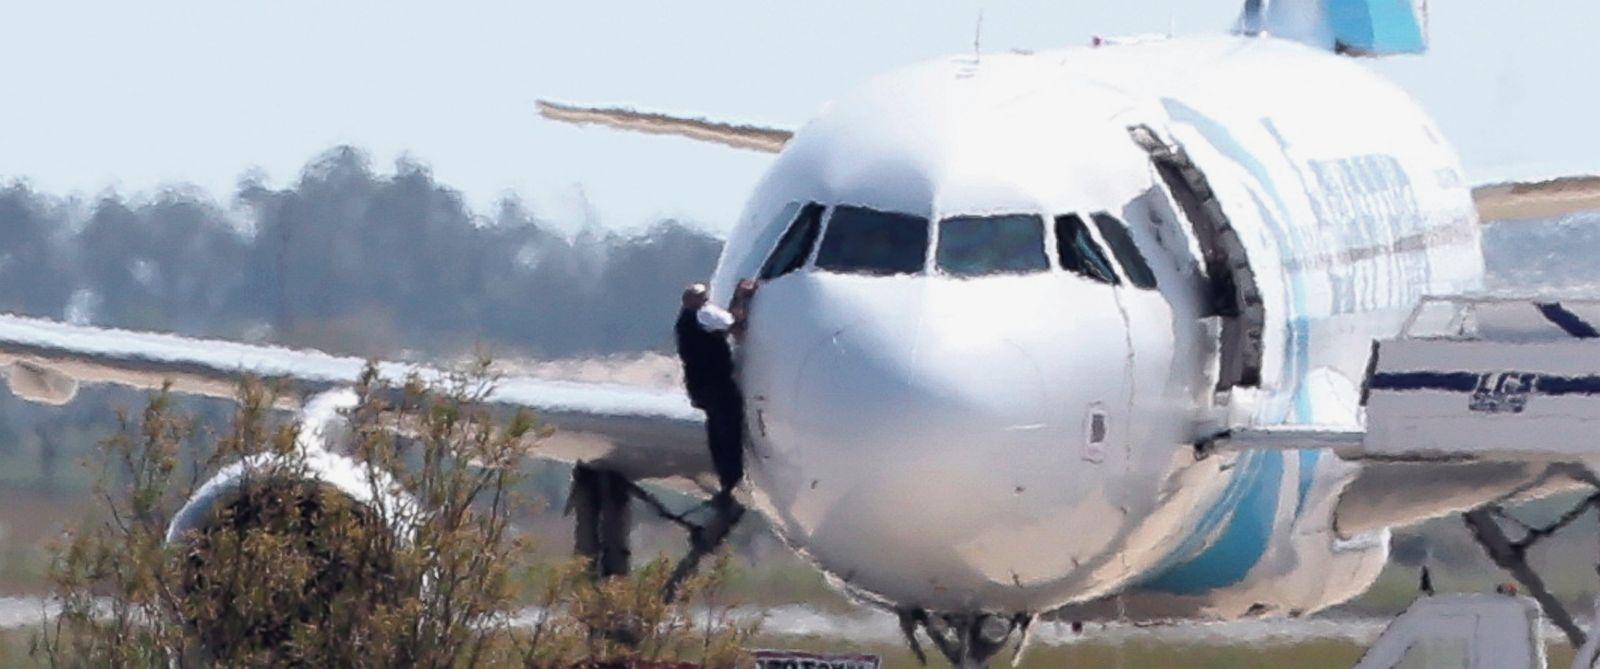 AP_Hijacked_Aircraft5_ml_160329_12x5_1600